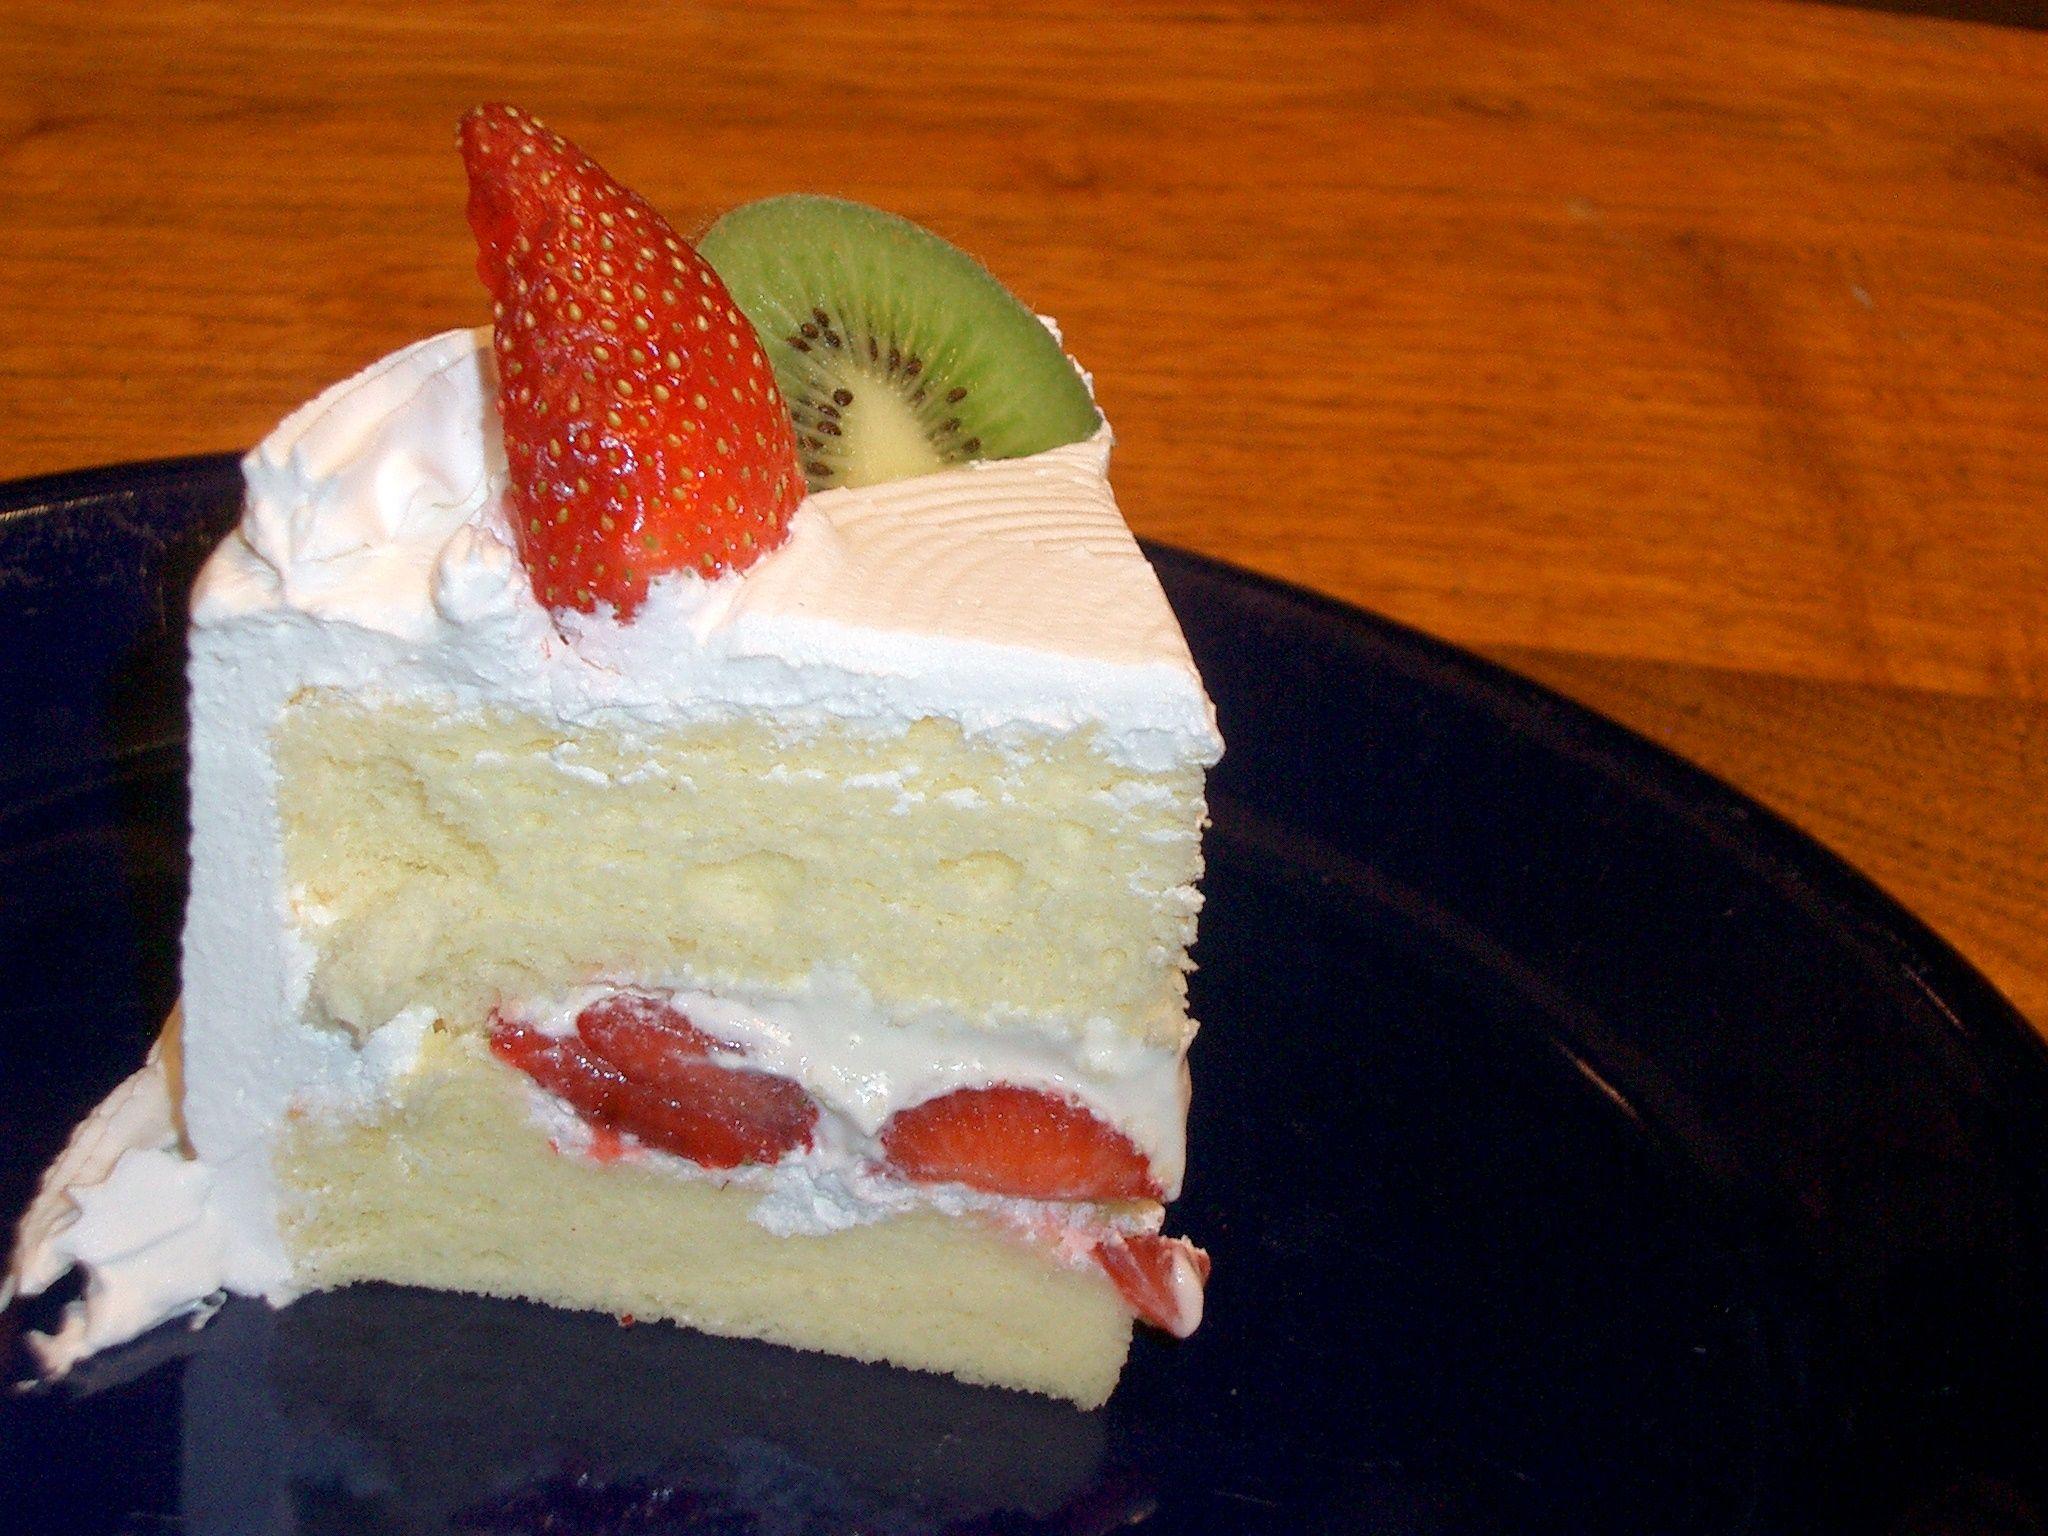 Strawberry Cream Cake from Golden Delight Bakery in Columbus Ohio